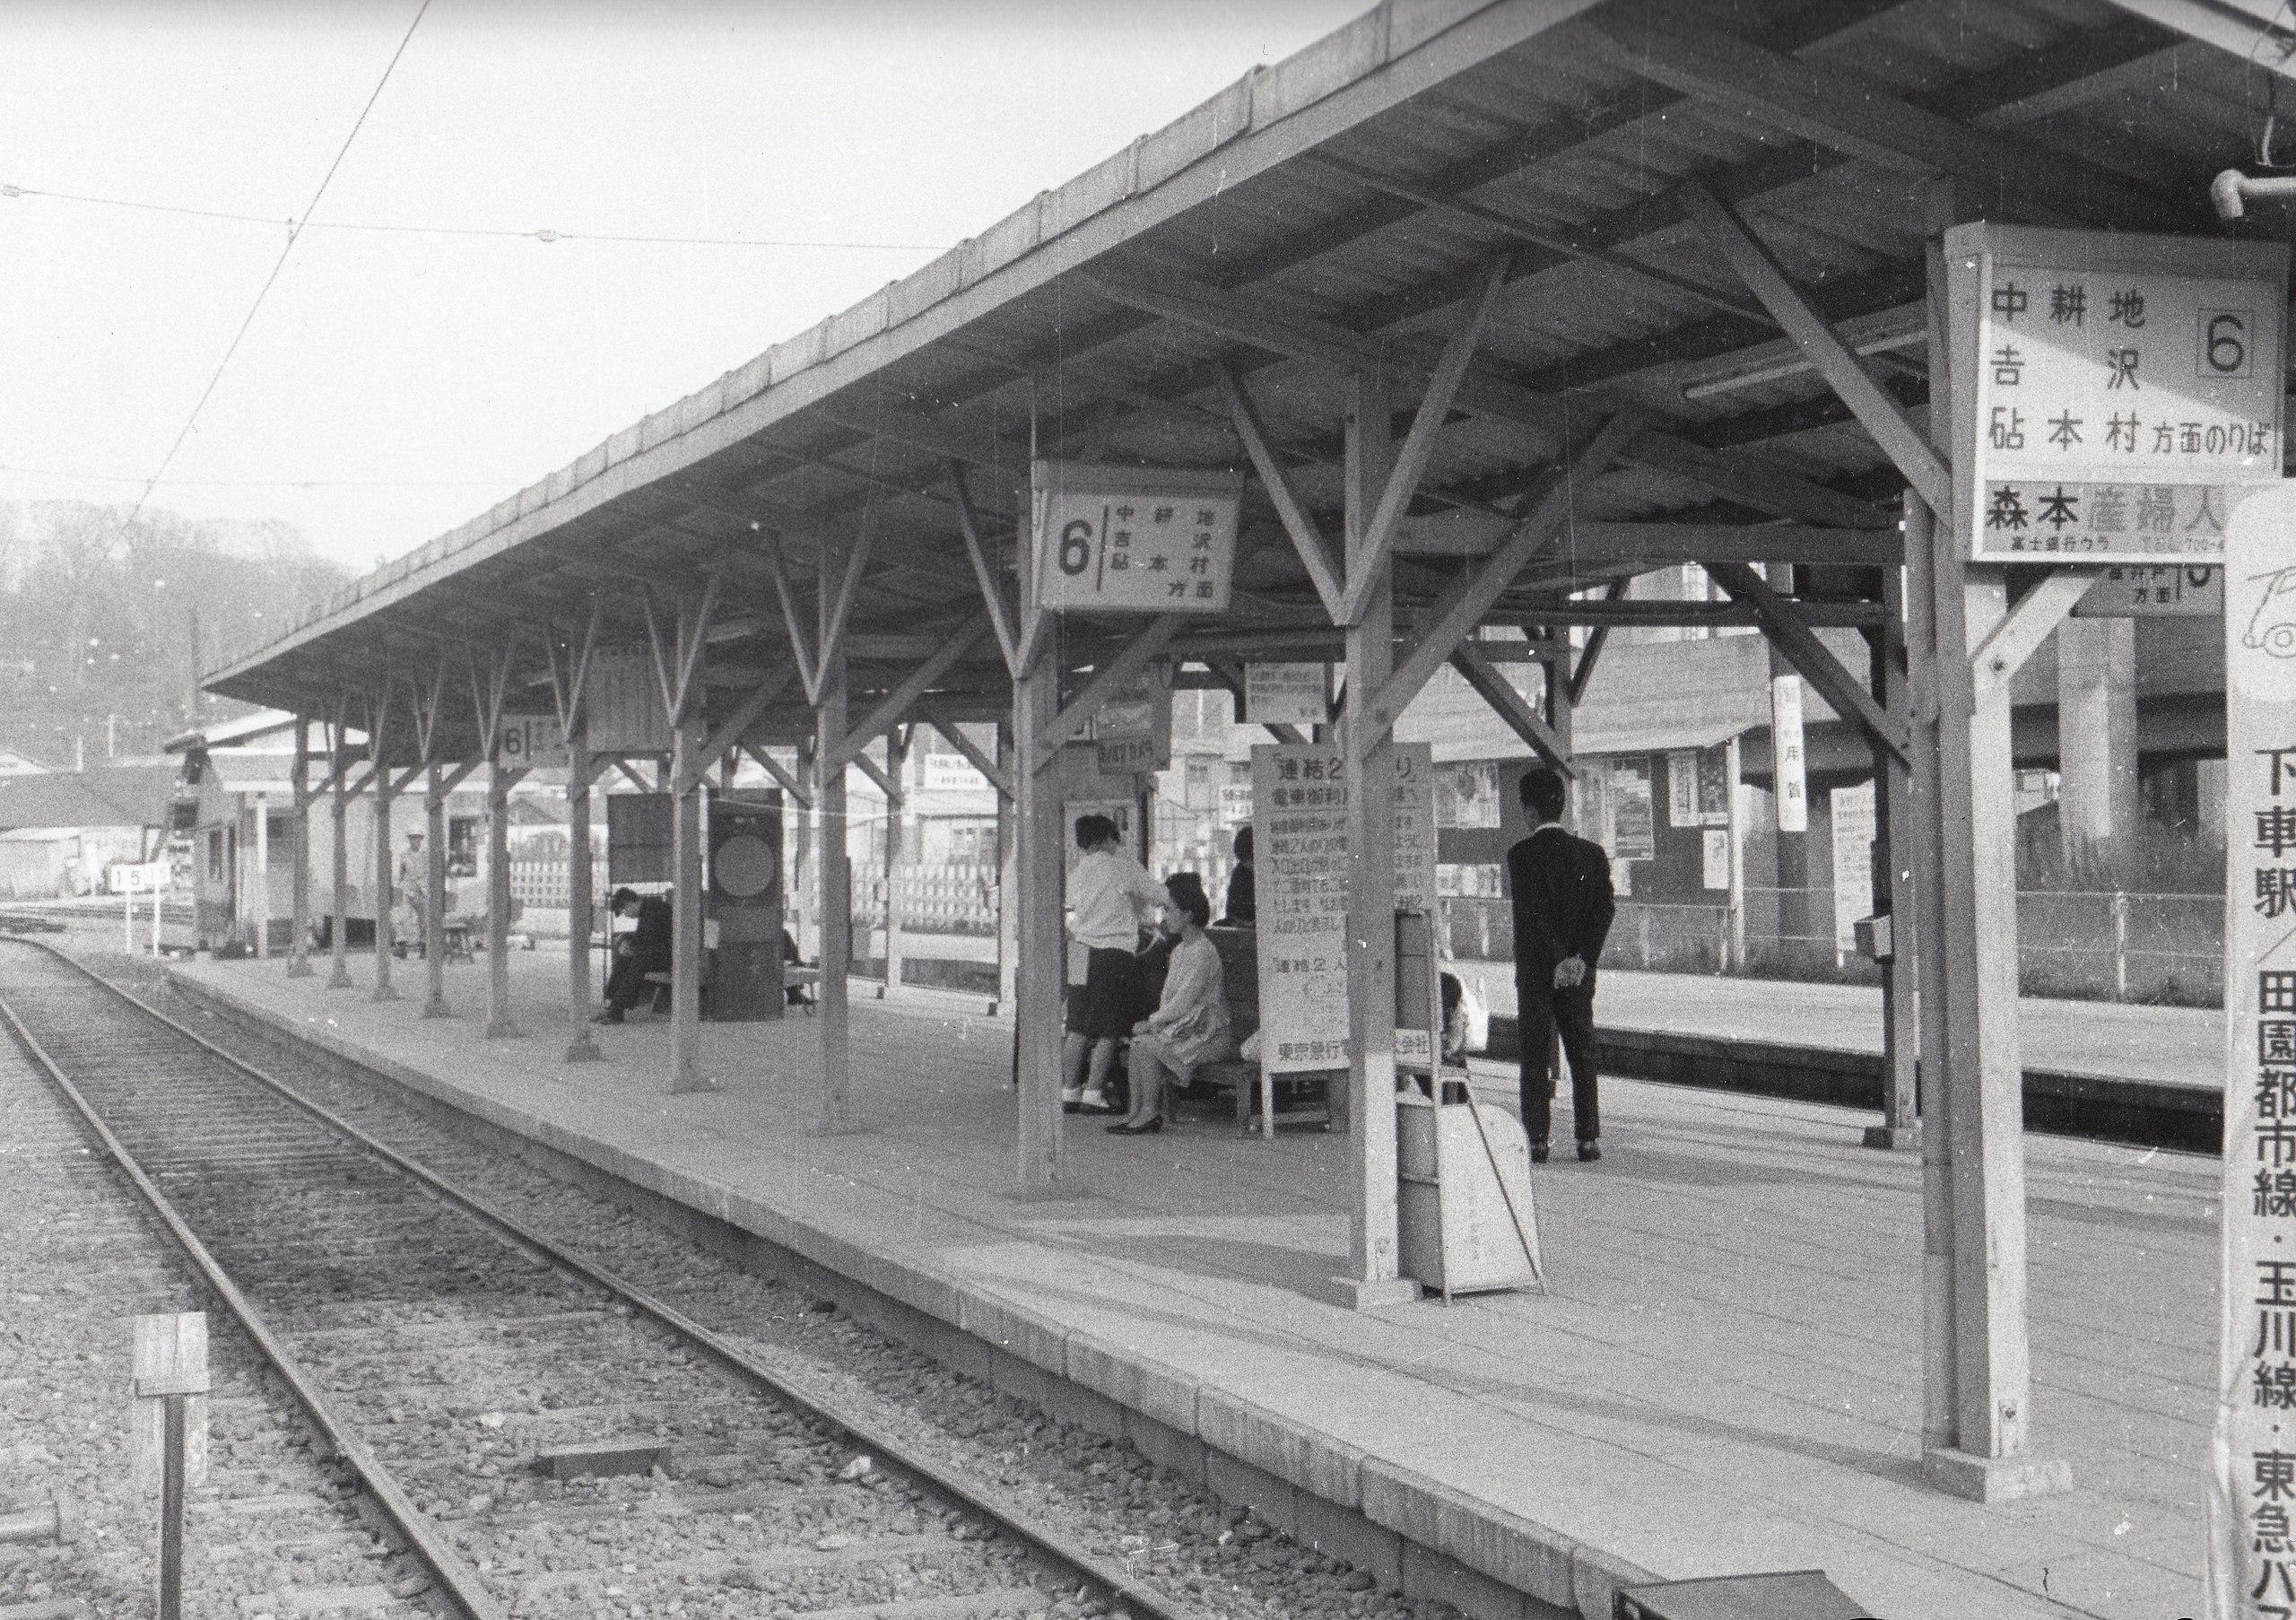 2560px-1968年の秋_二子玉川園駅 ...